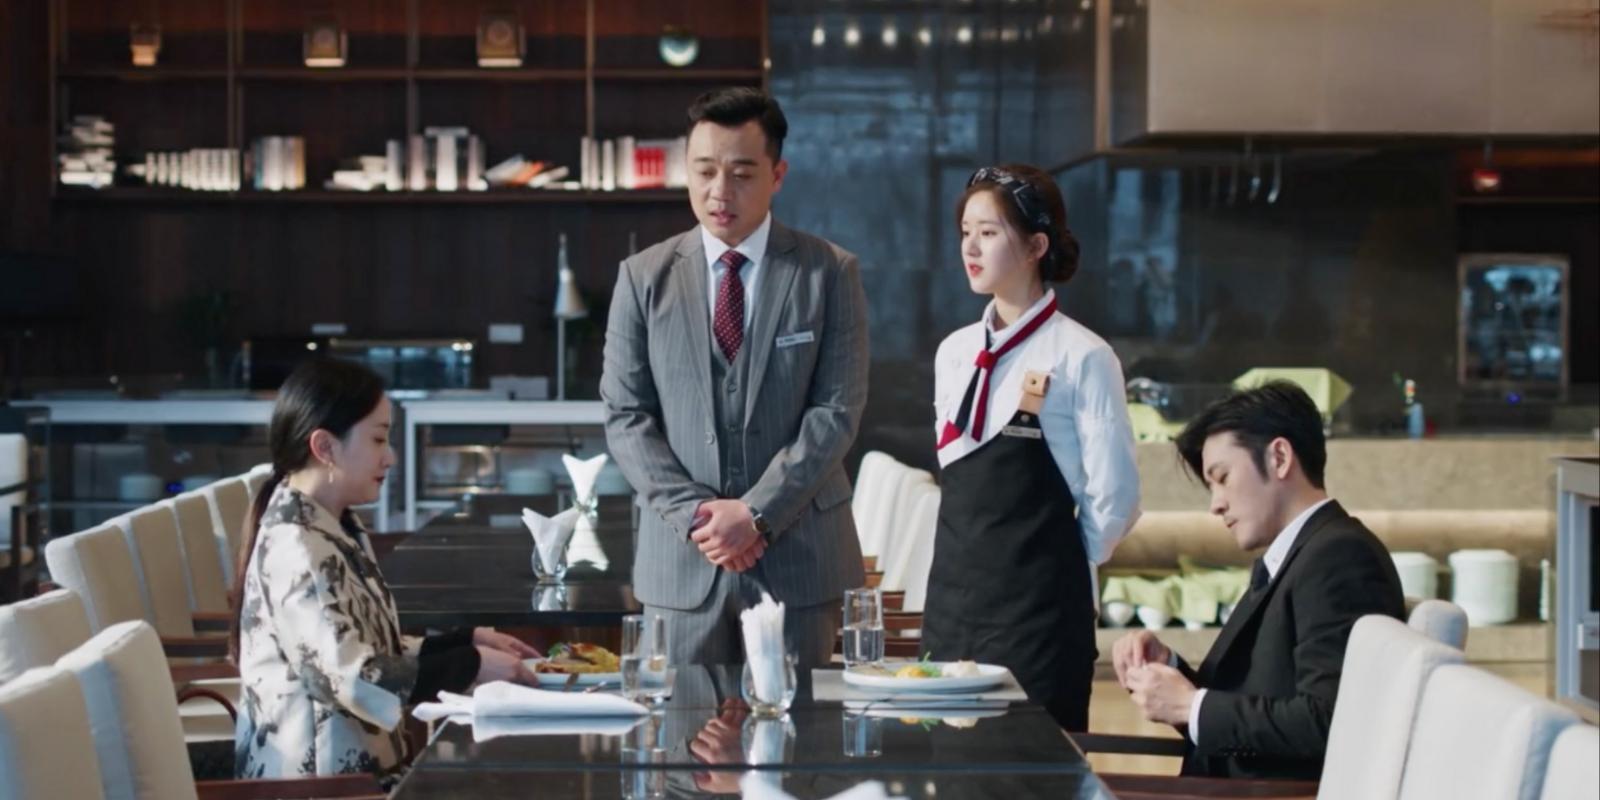 dating in the kitchen episode 8 recap li man's instigation